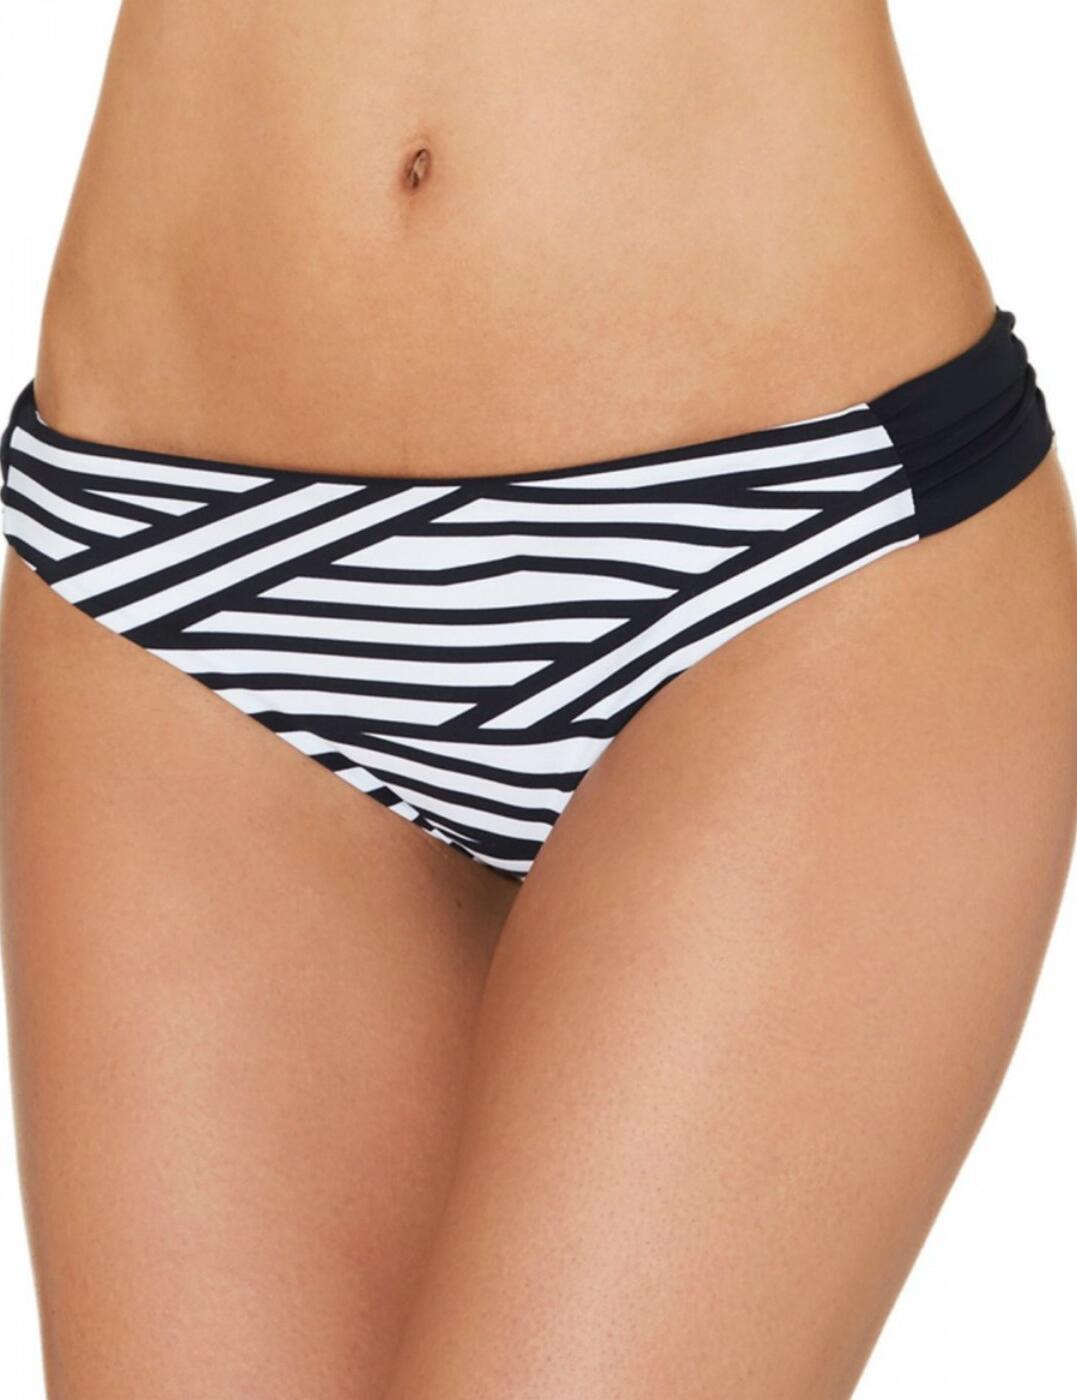 ER22 Aubade Ocean Bow Brazilian Bikini Brief - ER22 Sailor